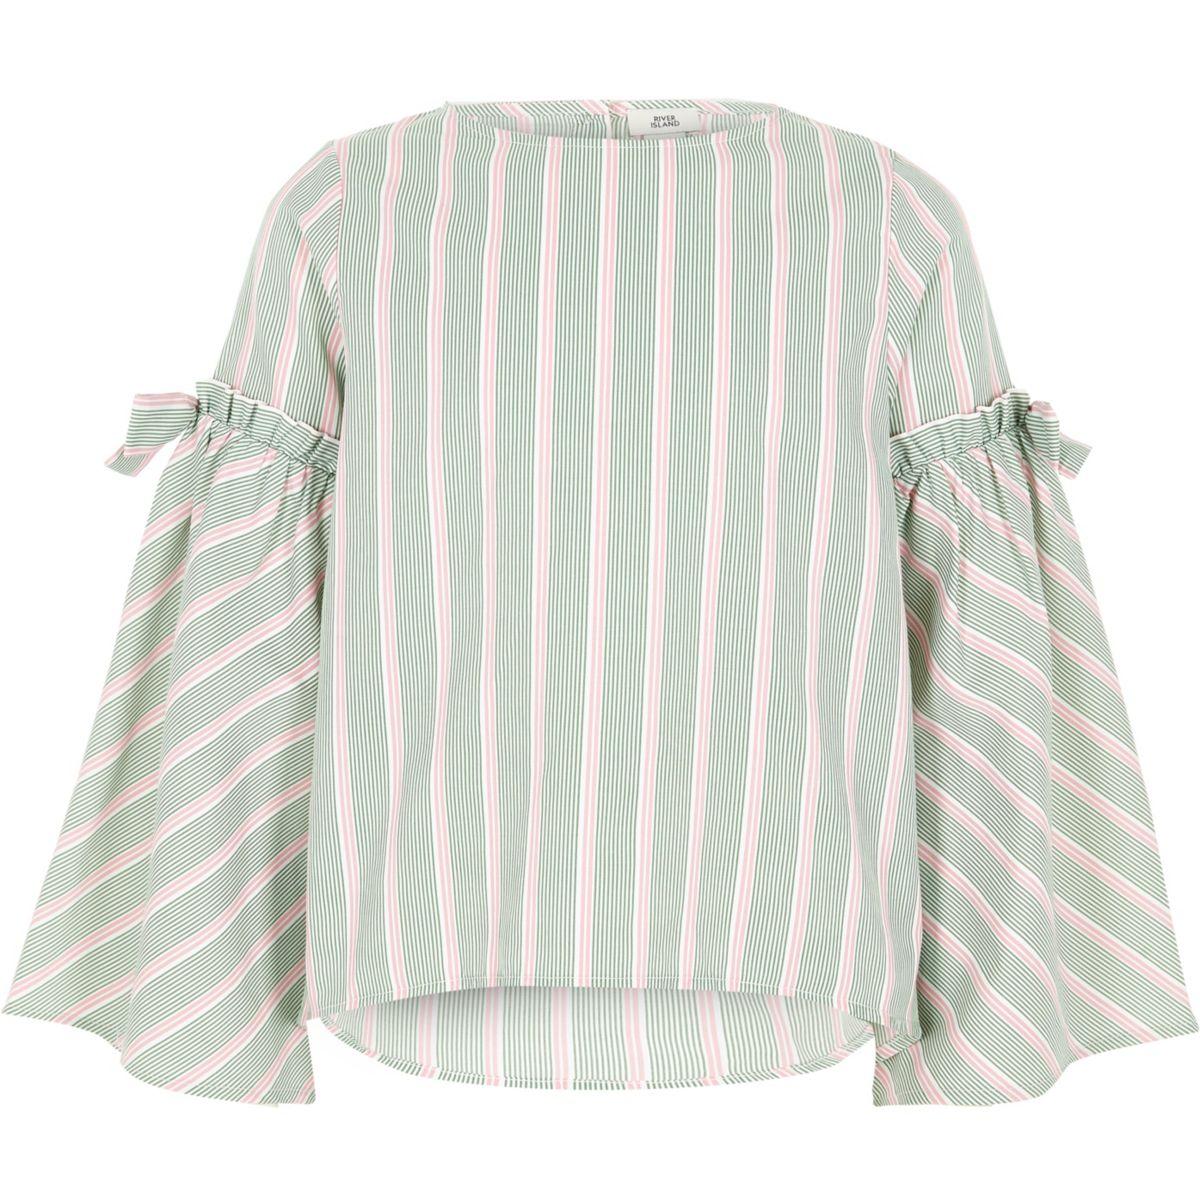 Girls green stripe bow bell sleeve top